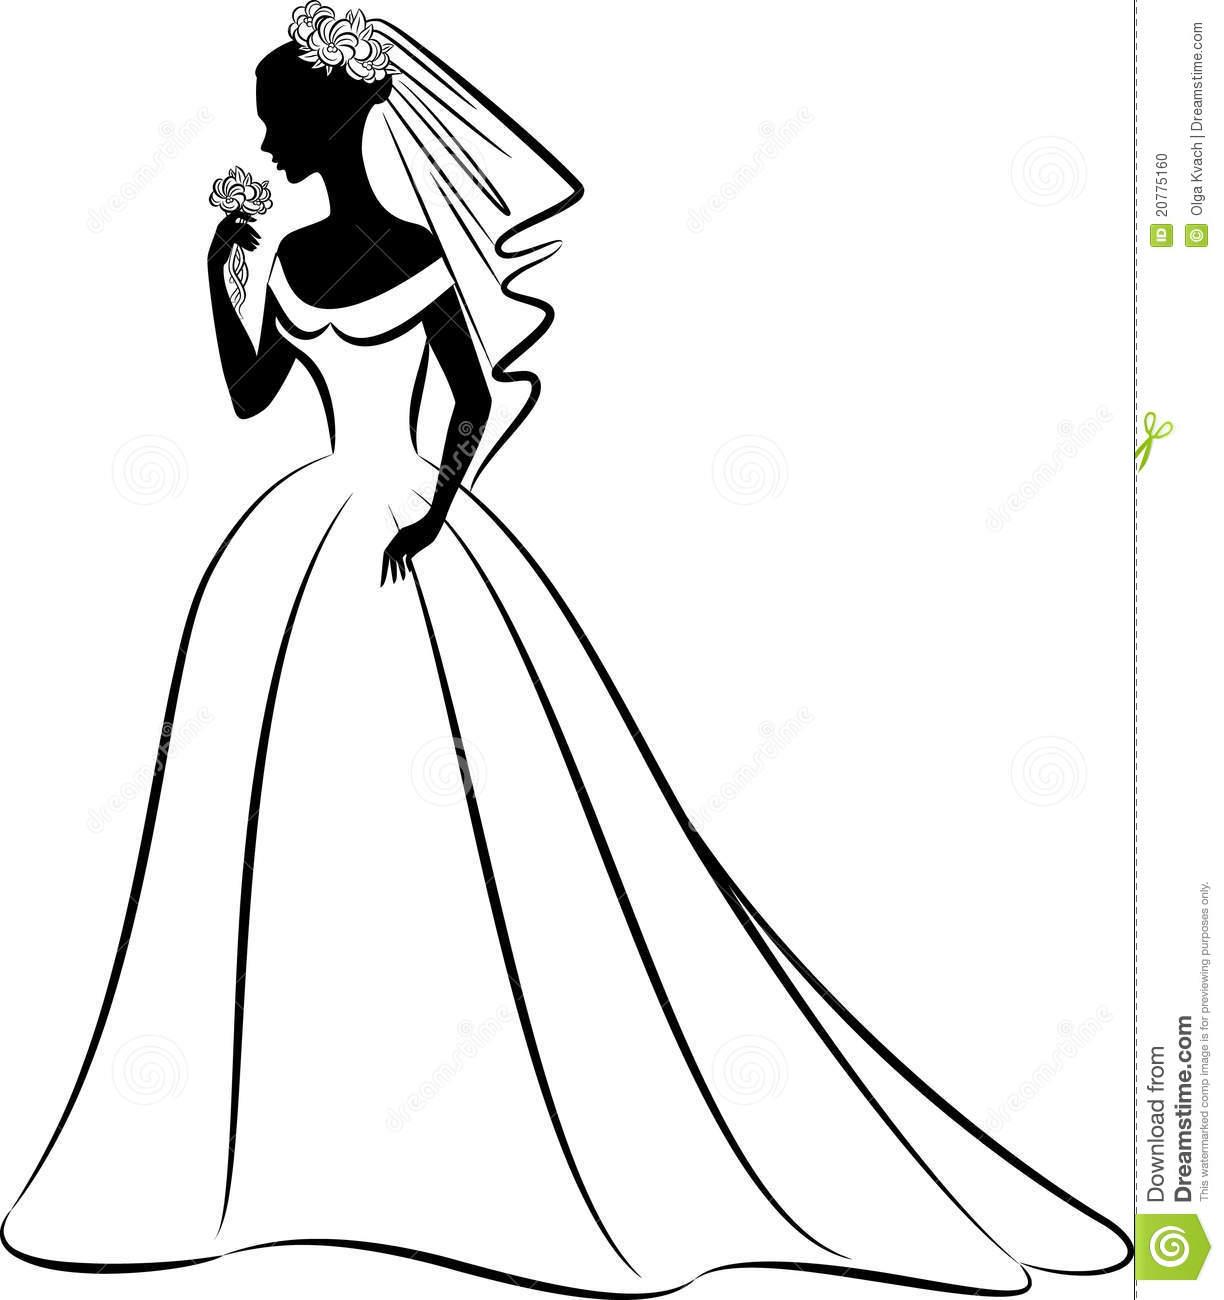 Vintage Wedding Dress Clipart Wedding Dr-Vintage Wedding Dress Clipart Wedding Dress Clipart Outline Silhouette-7